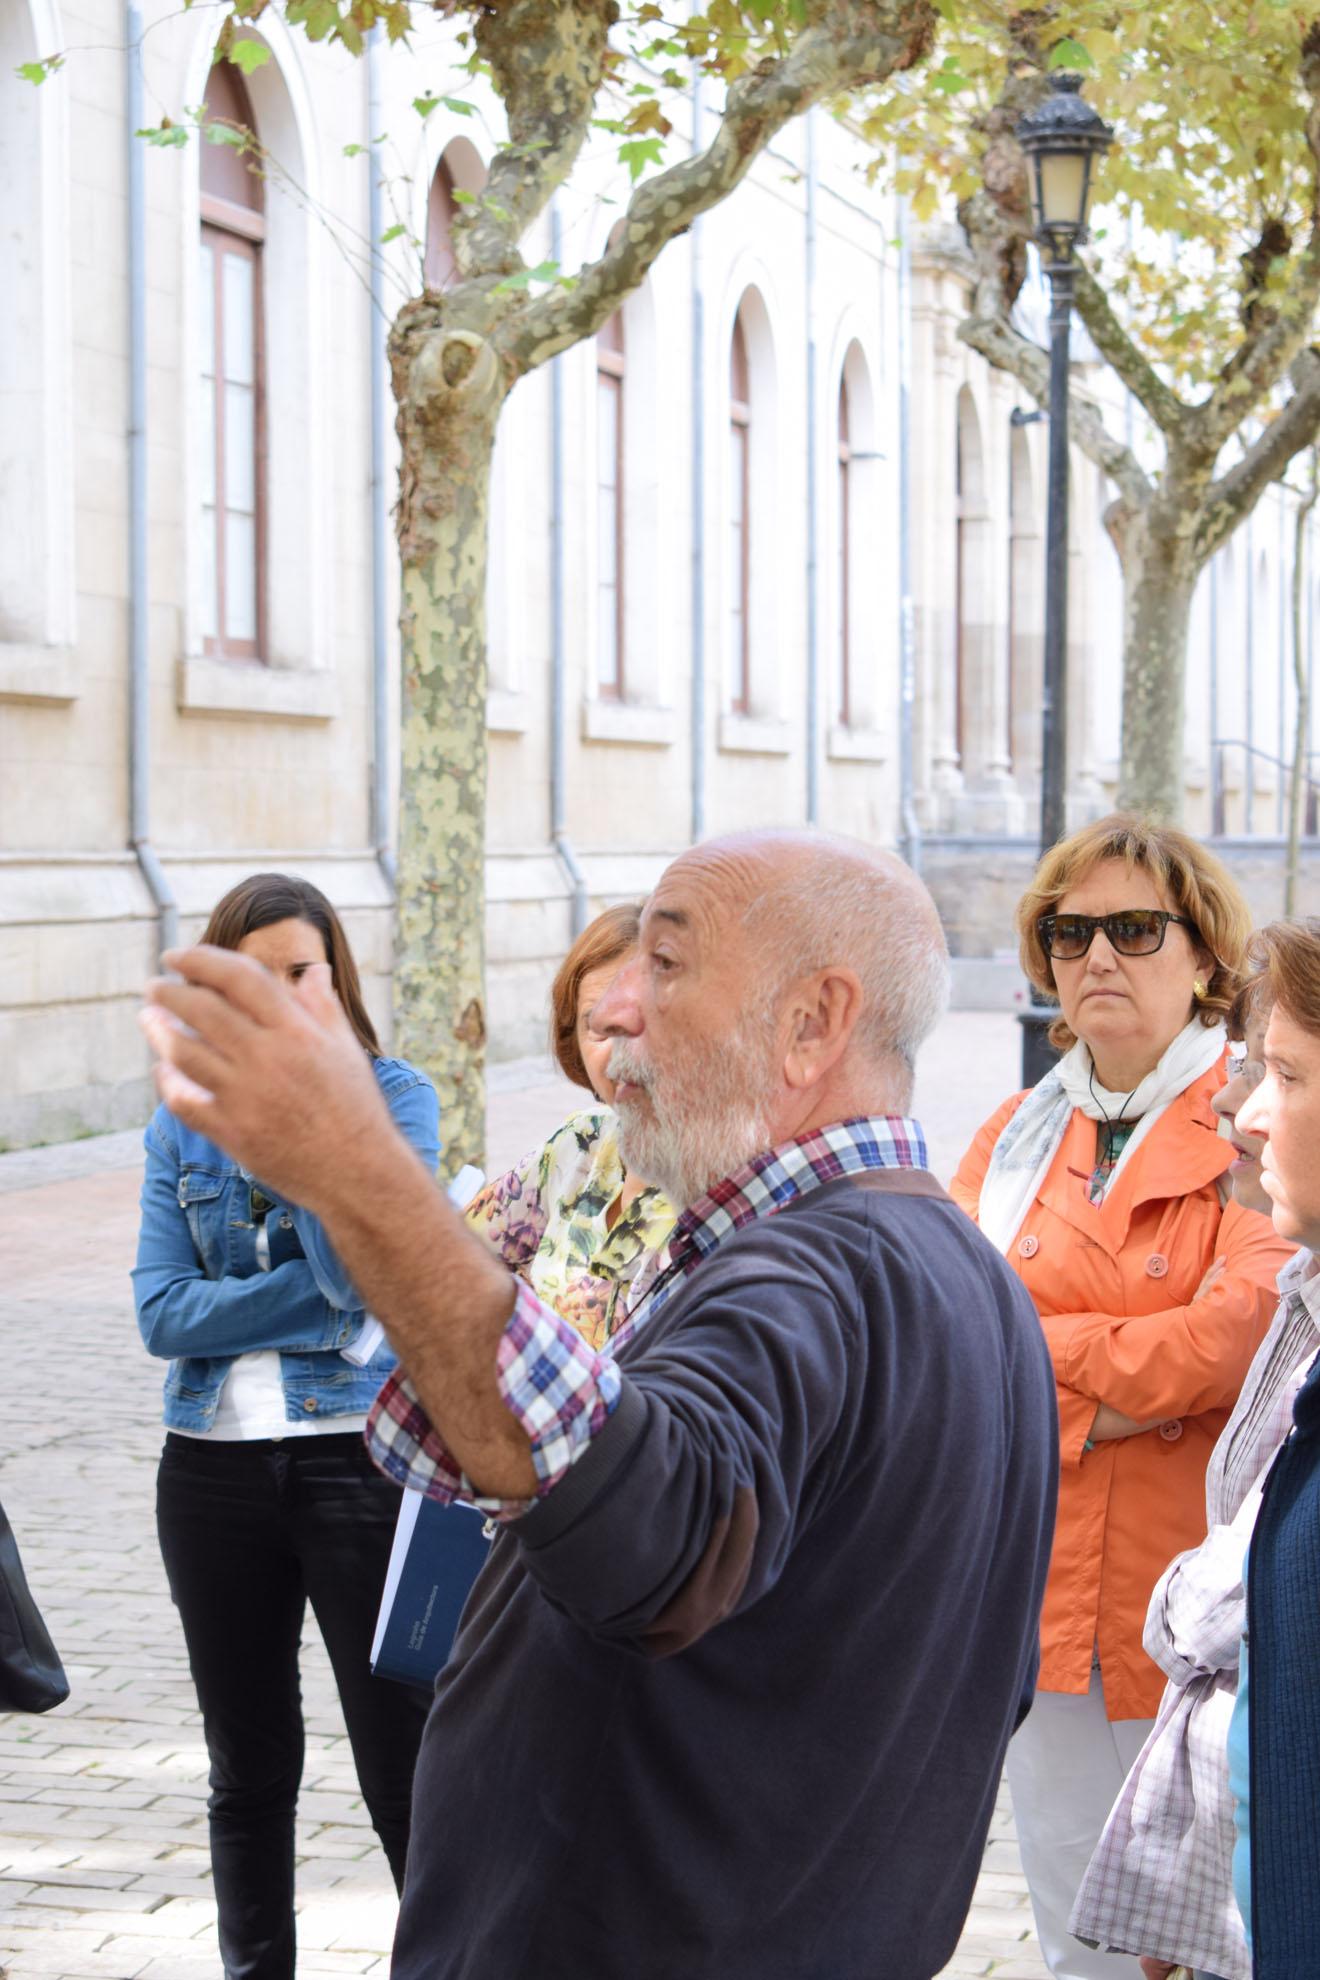 SEMANA-ARQUITECTURA-COAR-FCAR-paseo-espolon-glorieta-plaza-ayuntamiento-jose-miguel-leon (17_)